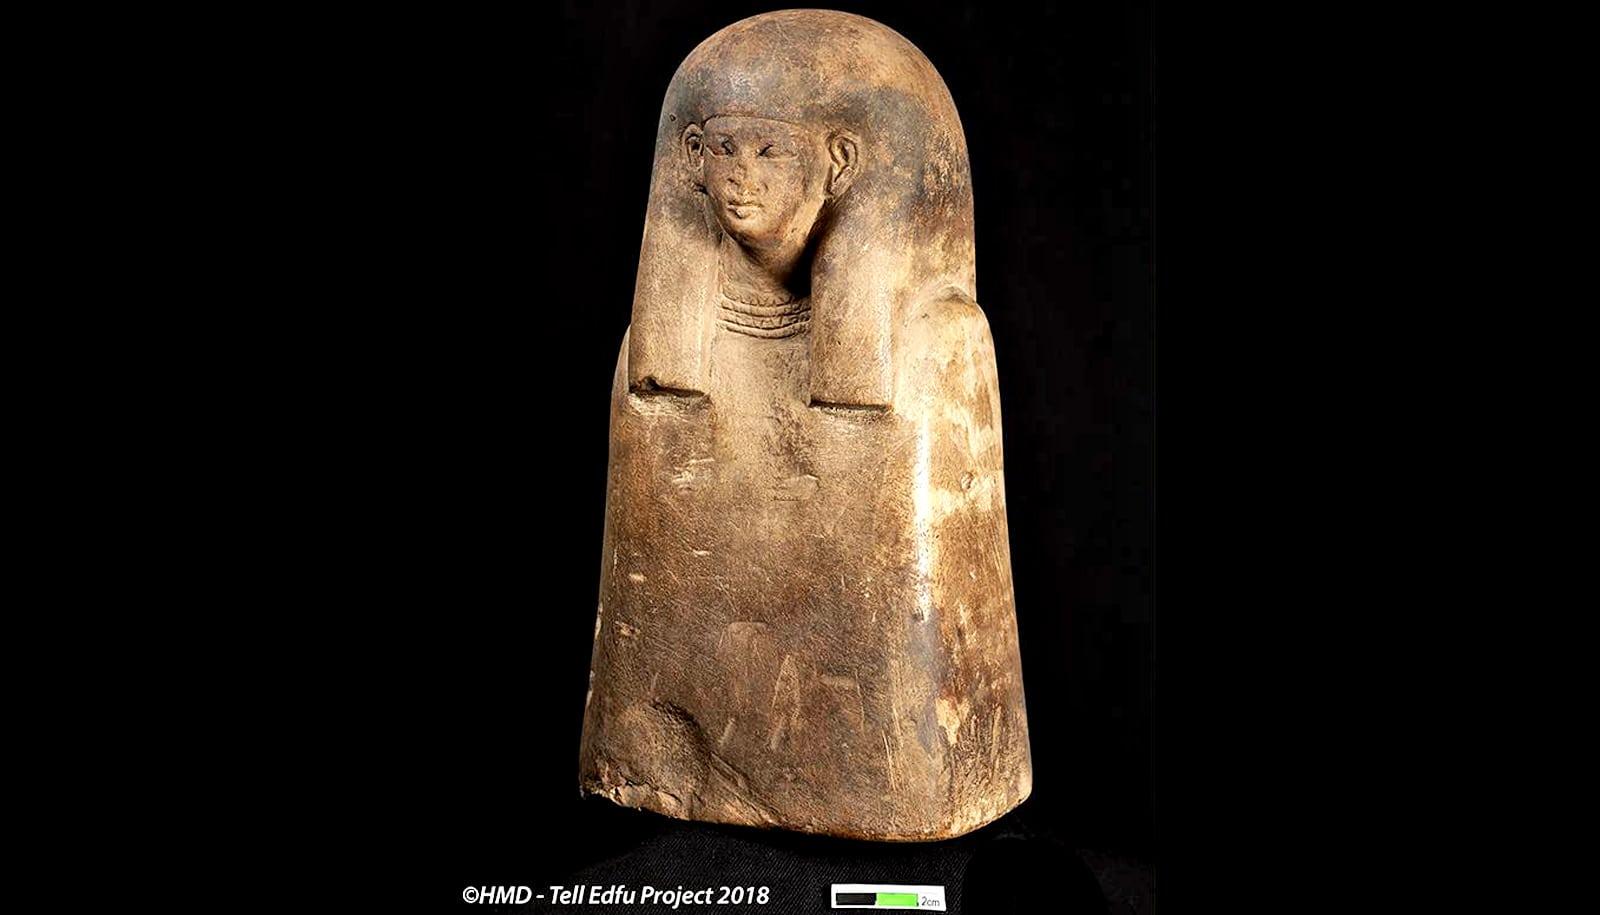 Female ancestor bust of limestone.